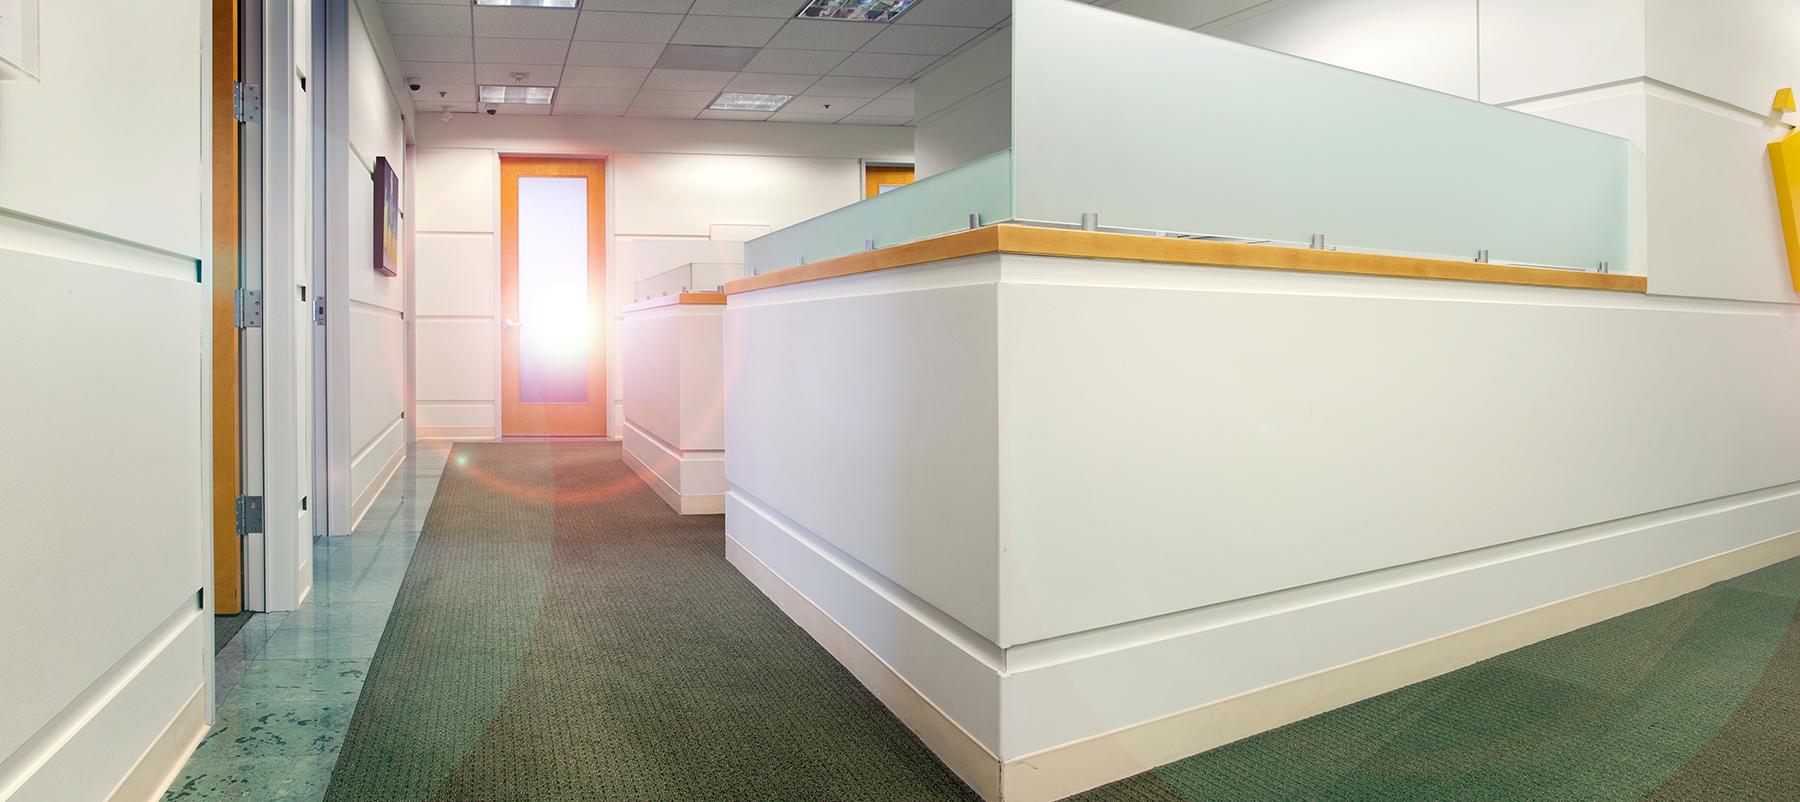 Kimball-Hall-Architecture-RAKLAW2.jpg